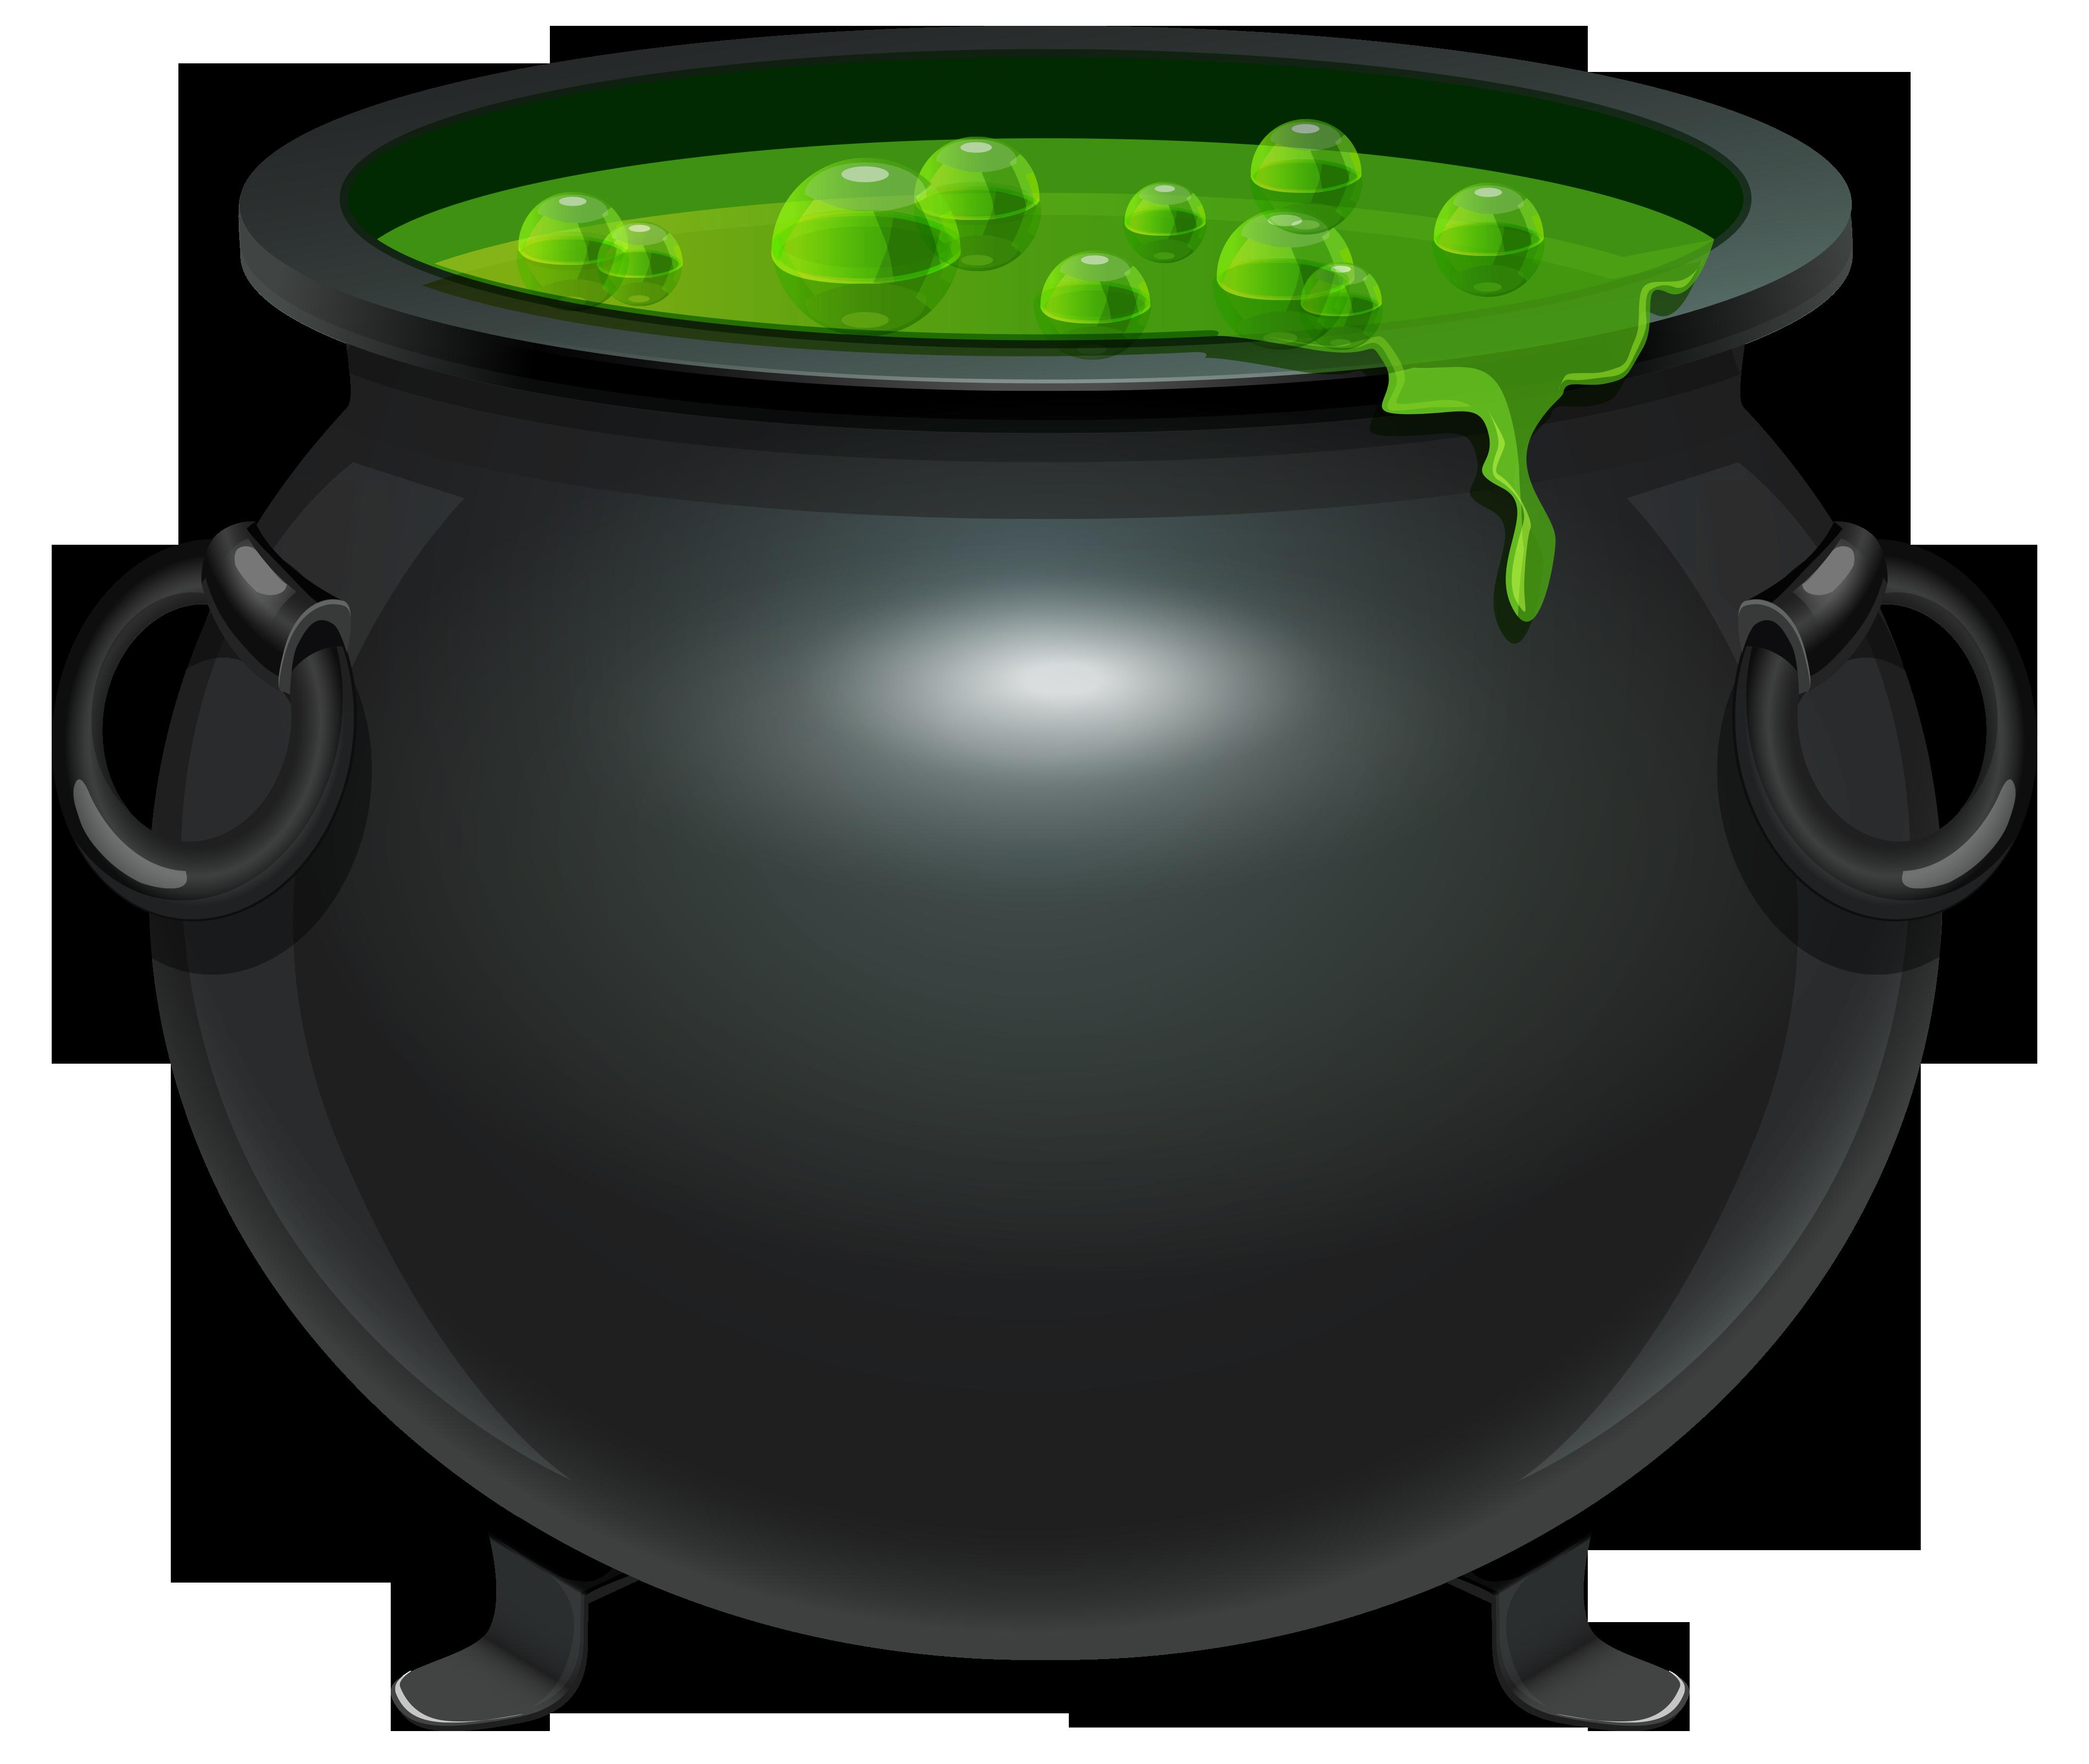 Cauldron PNG image free Download